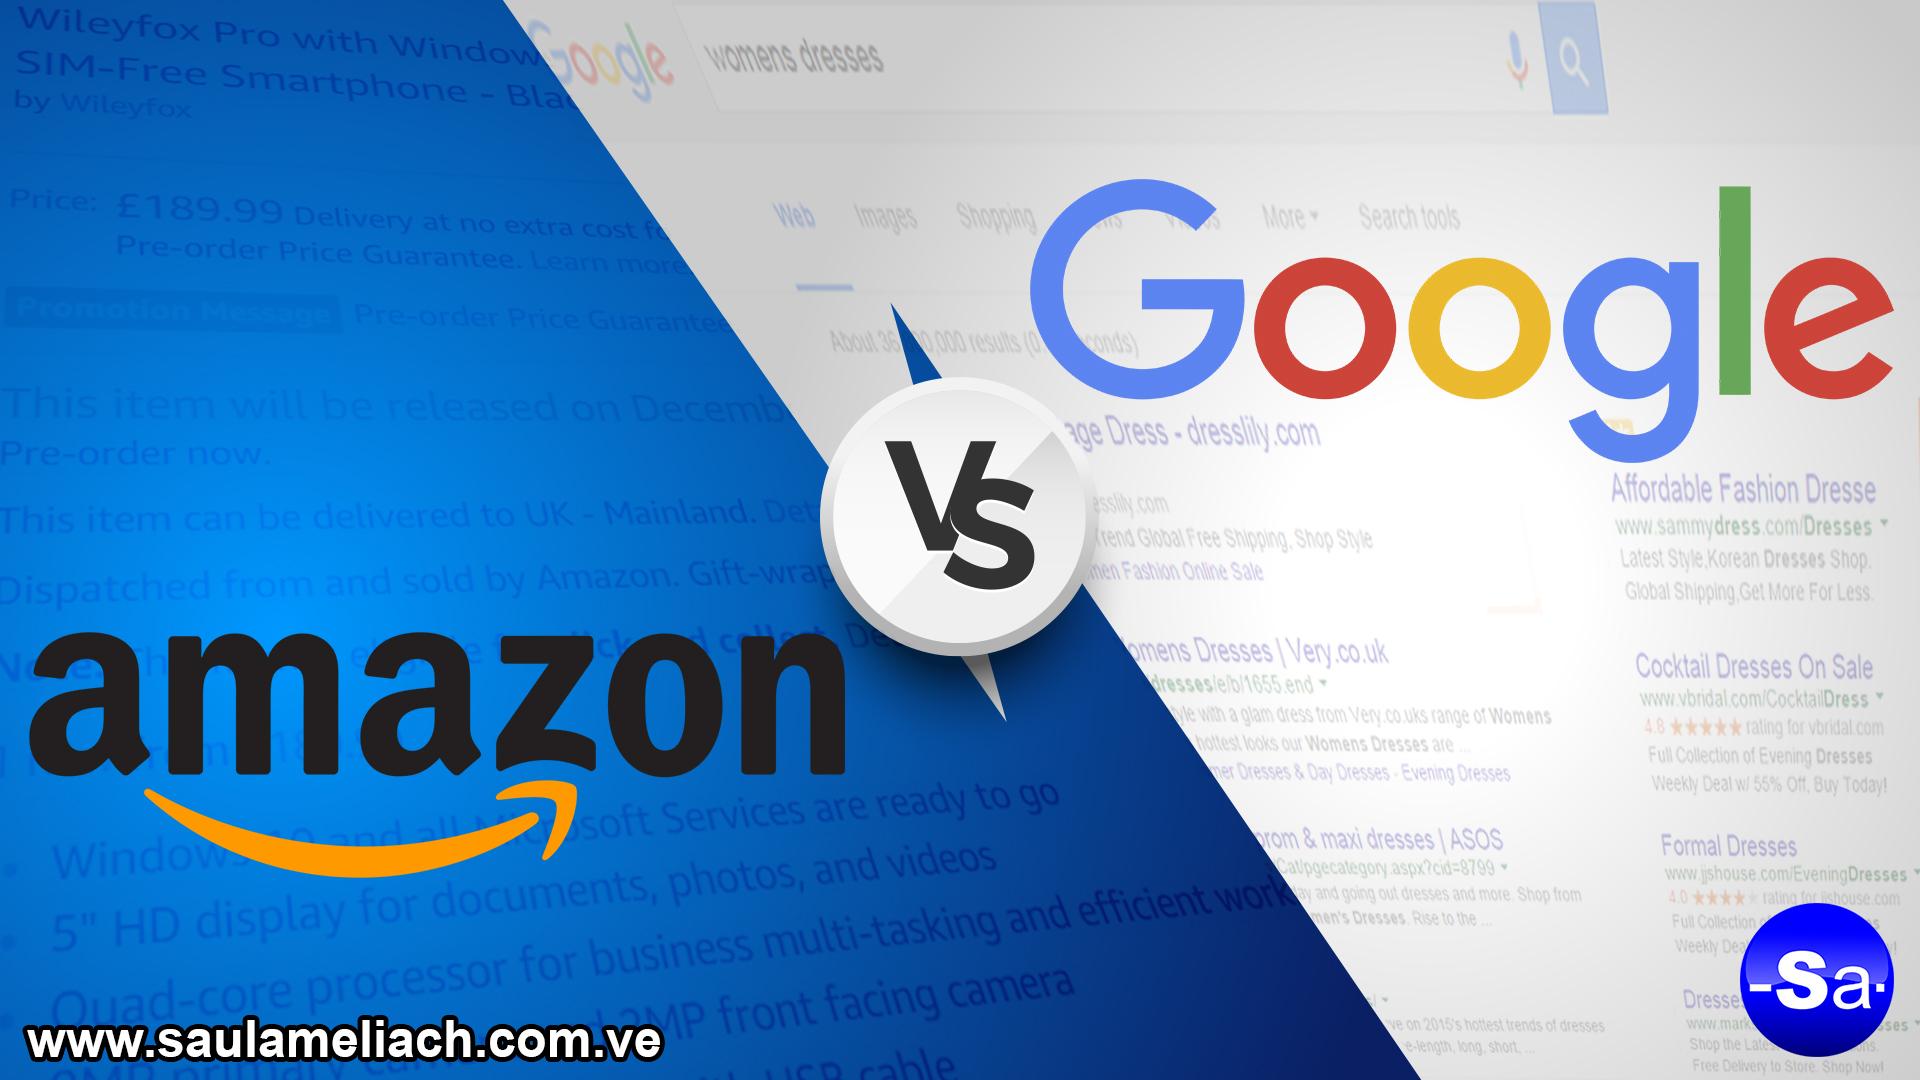 saul ameliach anuncios de Google anuncios publicitarios de Amazon